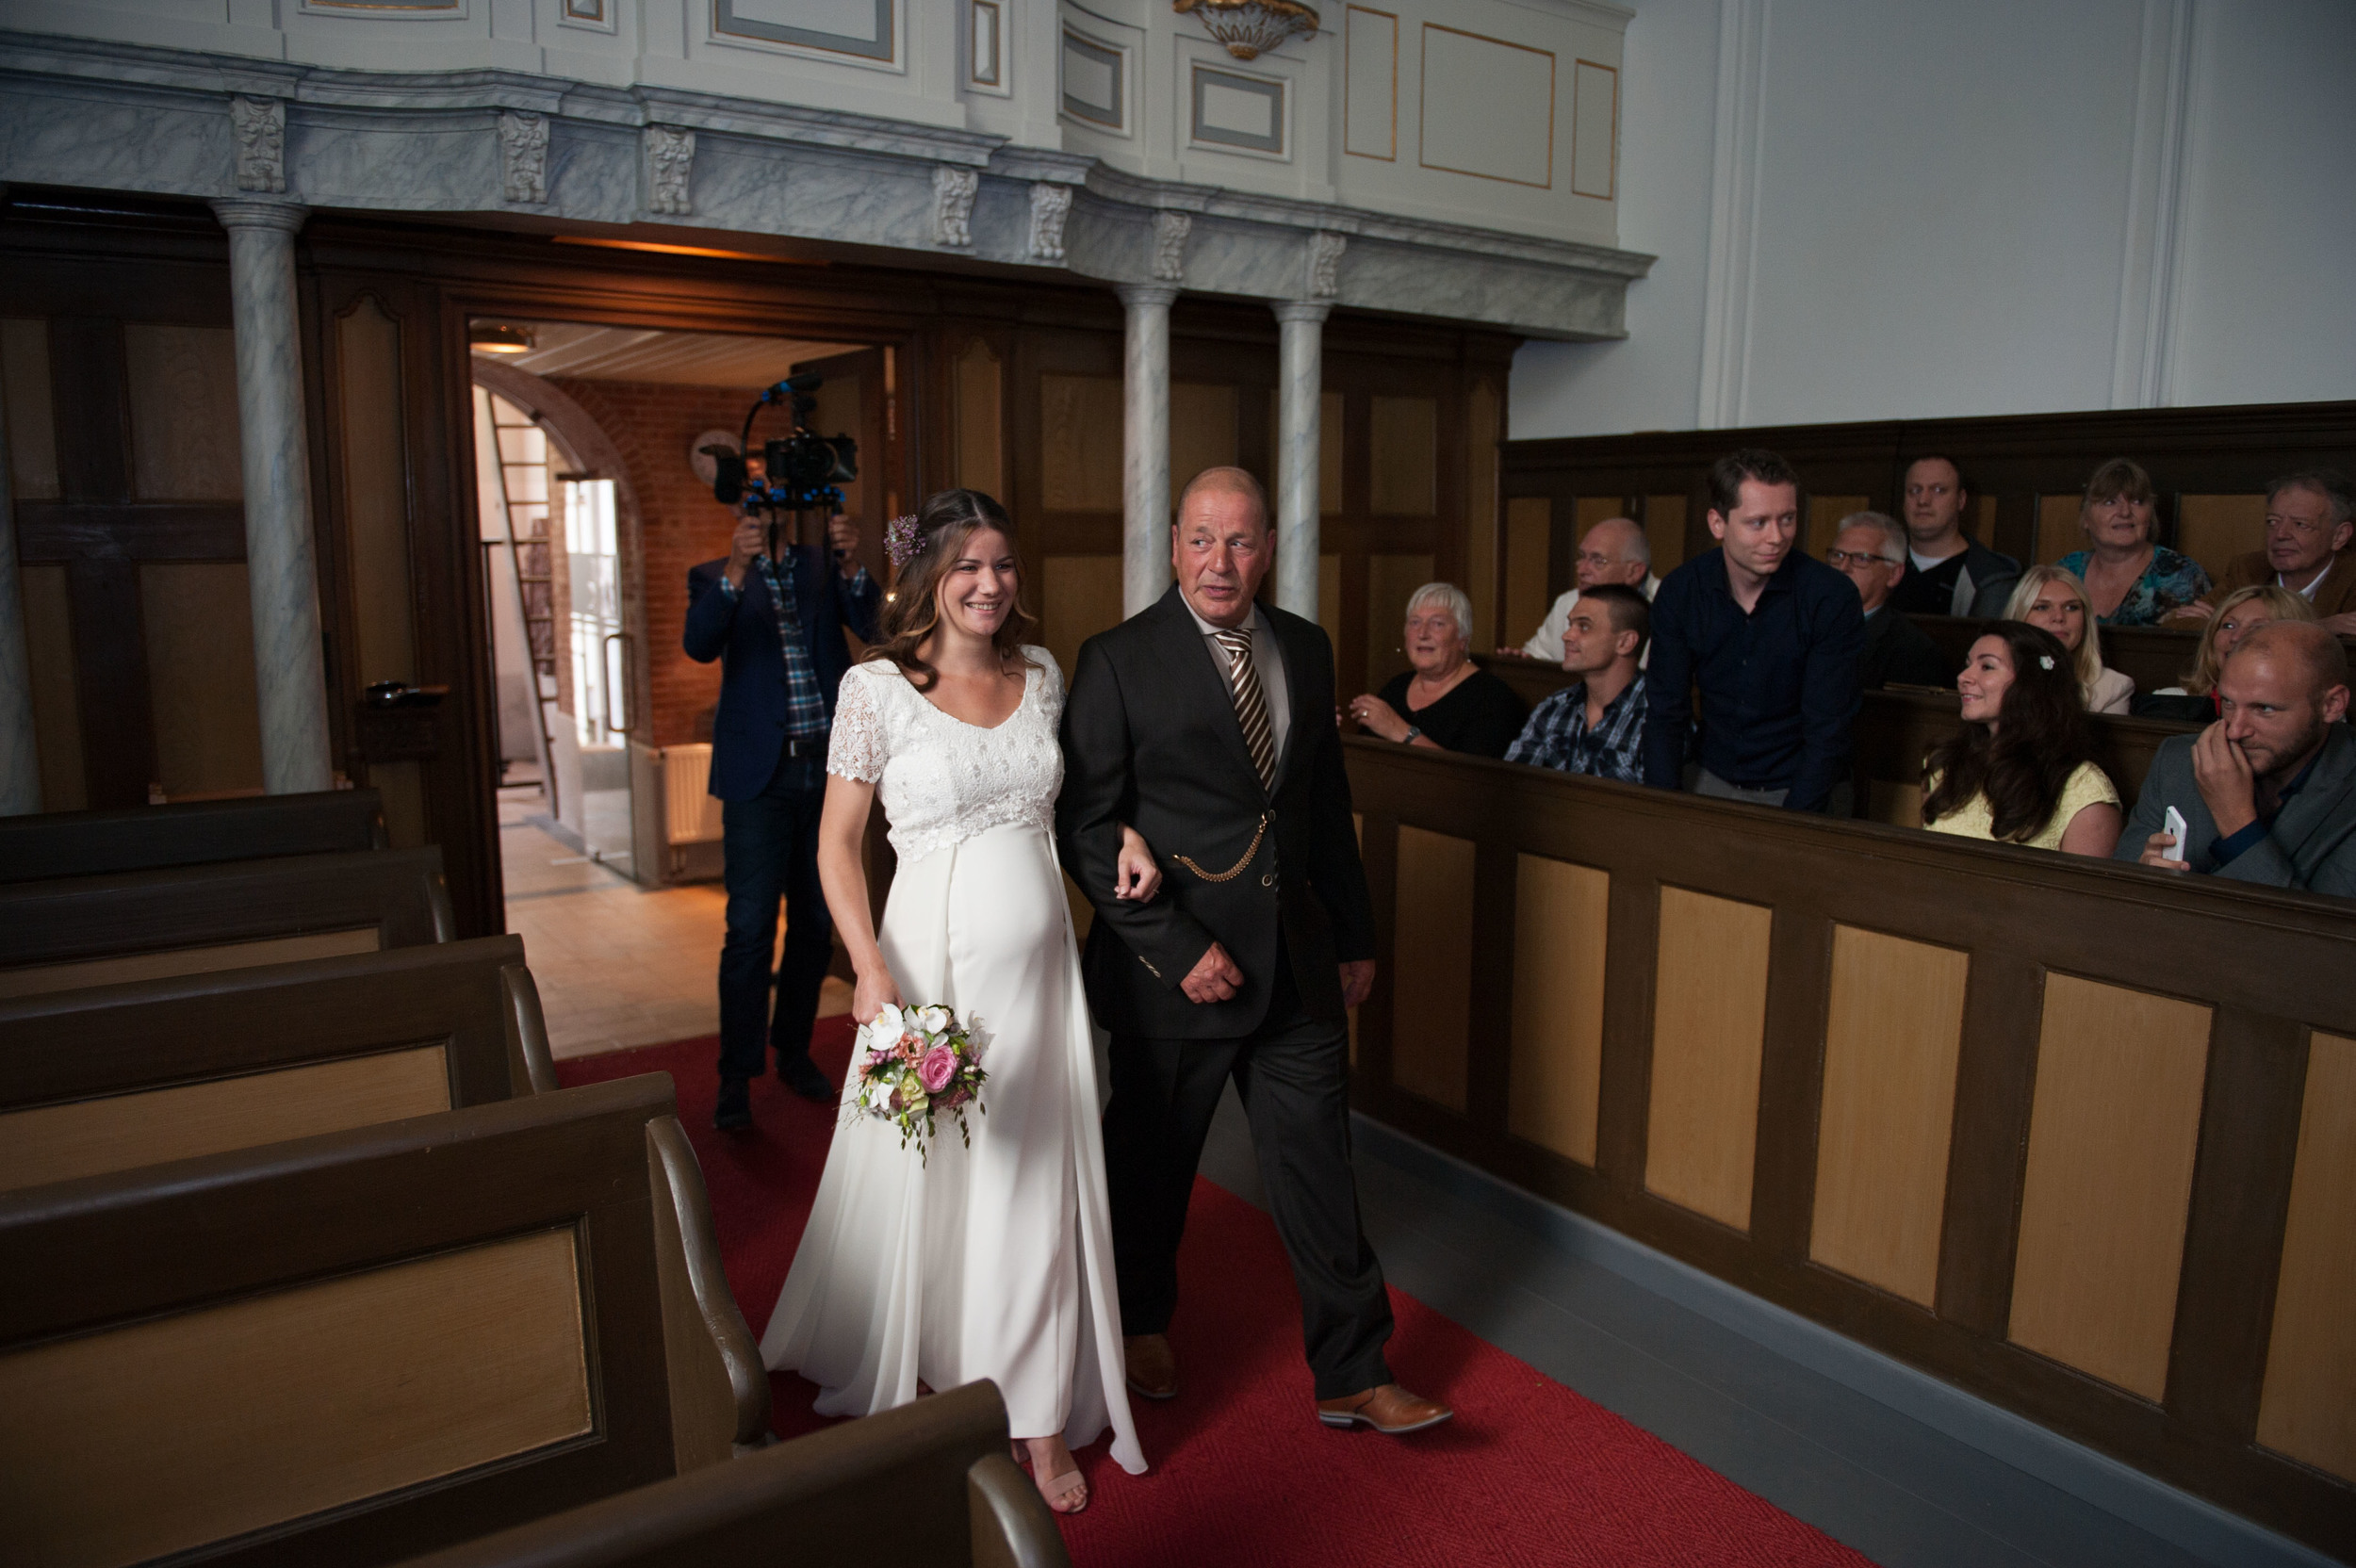 20140802_Cornwerd Wedding_2416.jpg